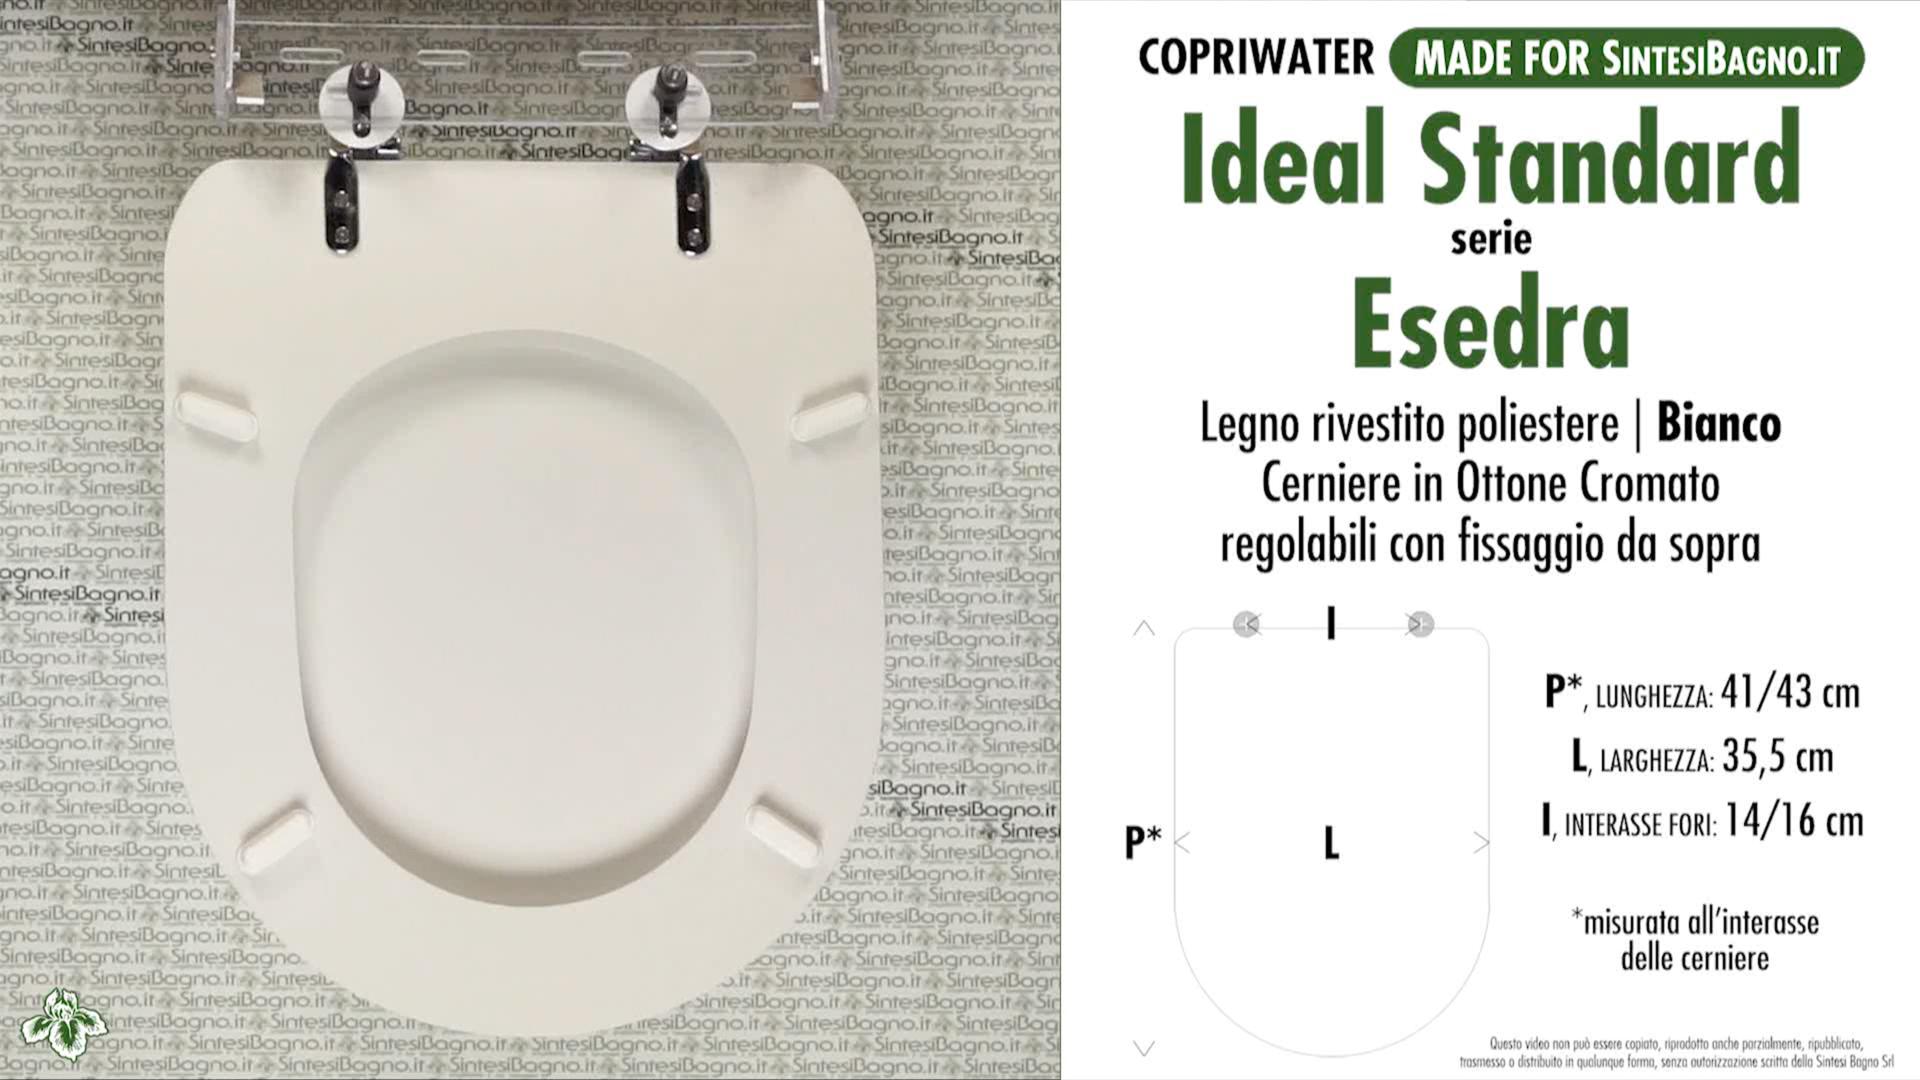 Schede tecniche misure copriwater ideal standard serie esedra for Calla ideal standard scheda tecnica